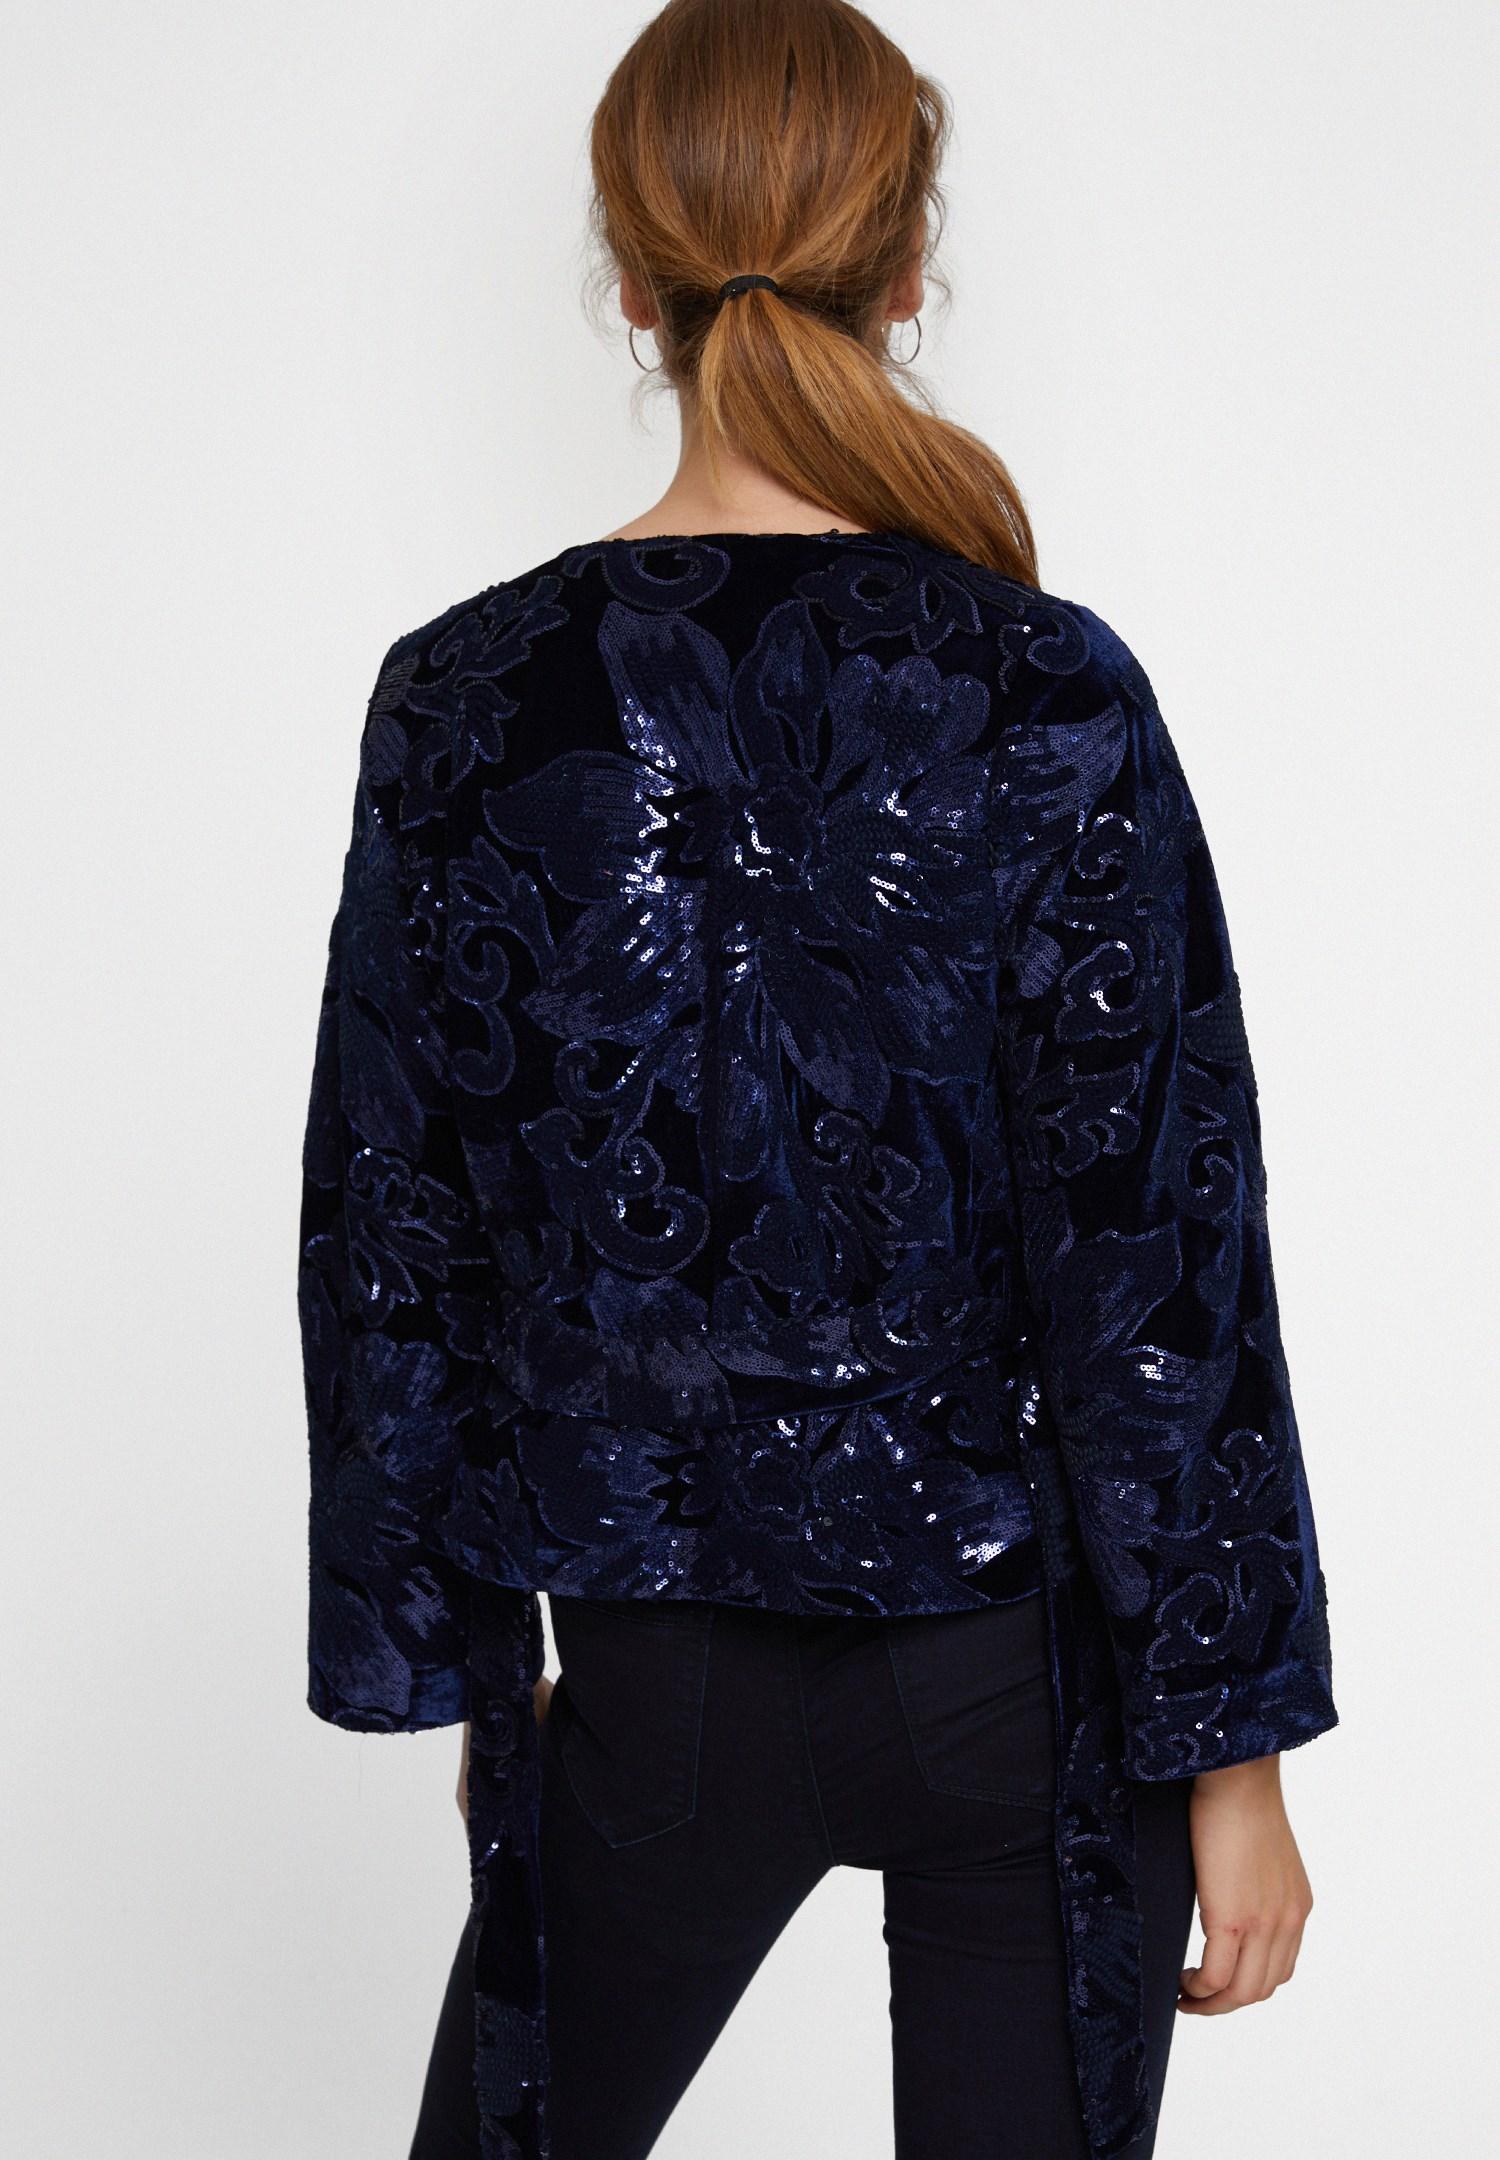 Bayan Lacivert Payetli Ceket